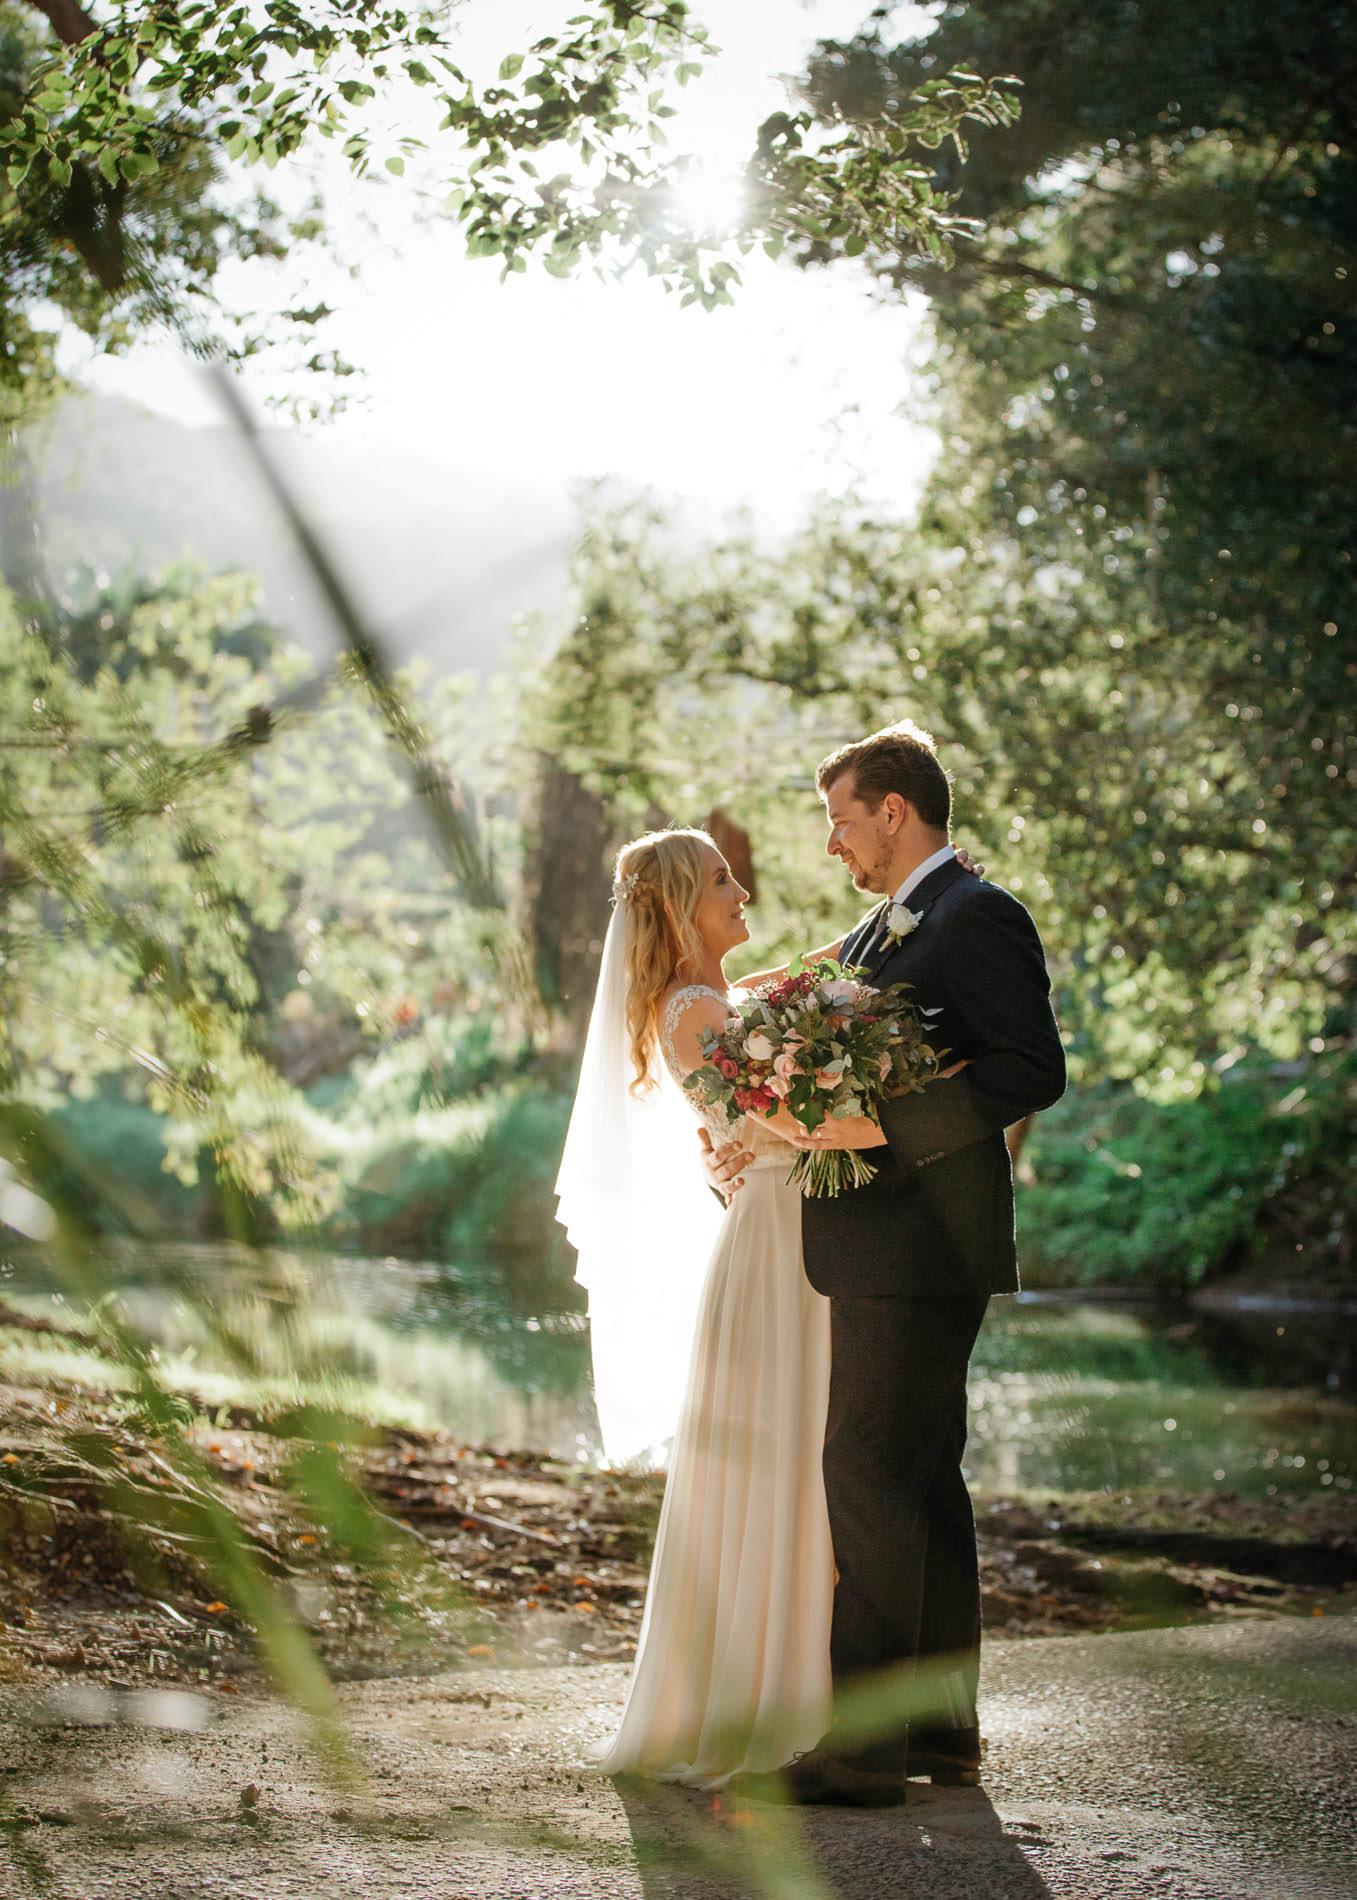 True North Photography_Boomerang Farm_Stacey and Isaac_Gold Coast Wedding_Barm Wedding_Hinterland Wedding-137.jpg